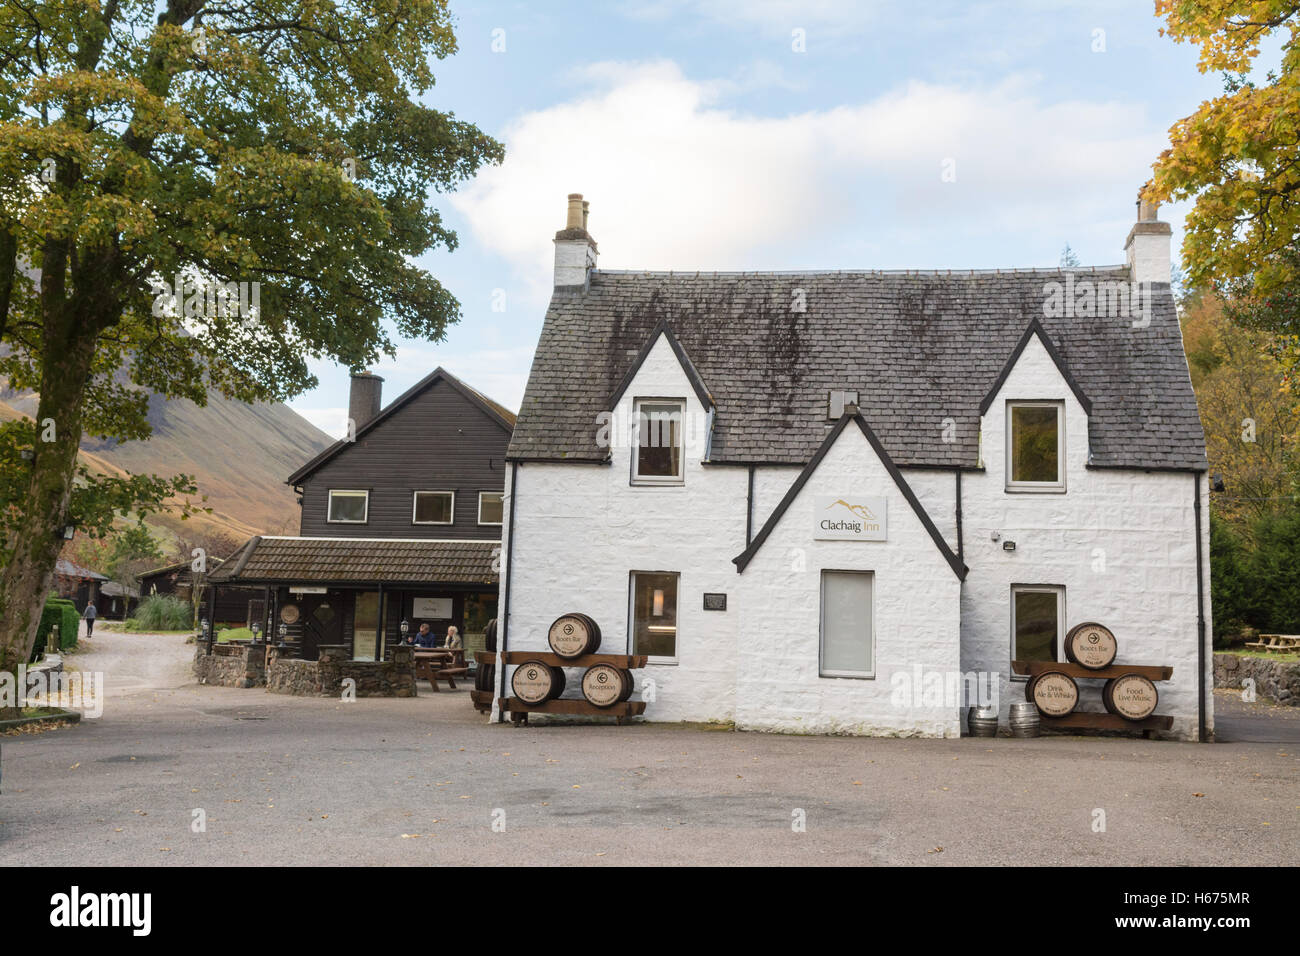 Clachaig Inn, Glen Coe, Scotland, UK - Stock Image